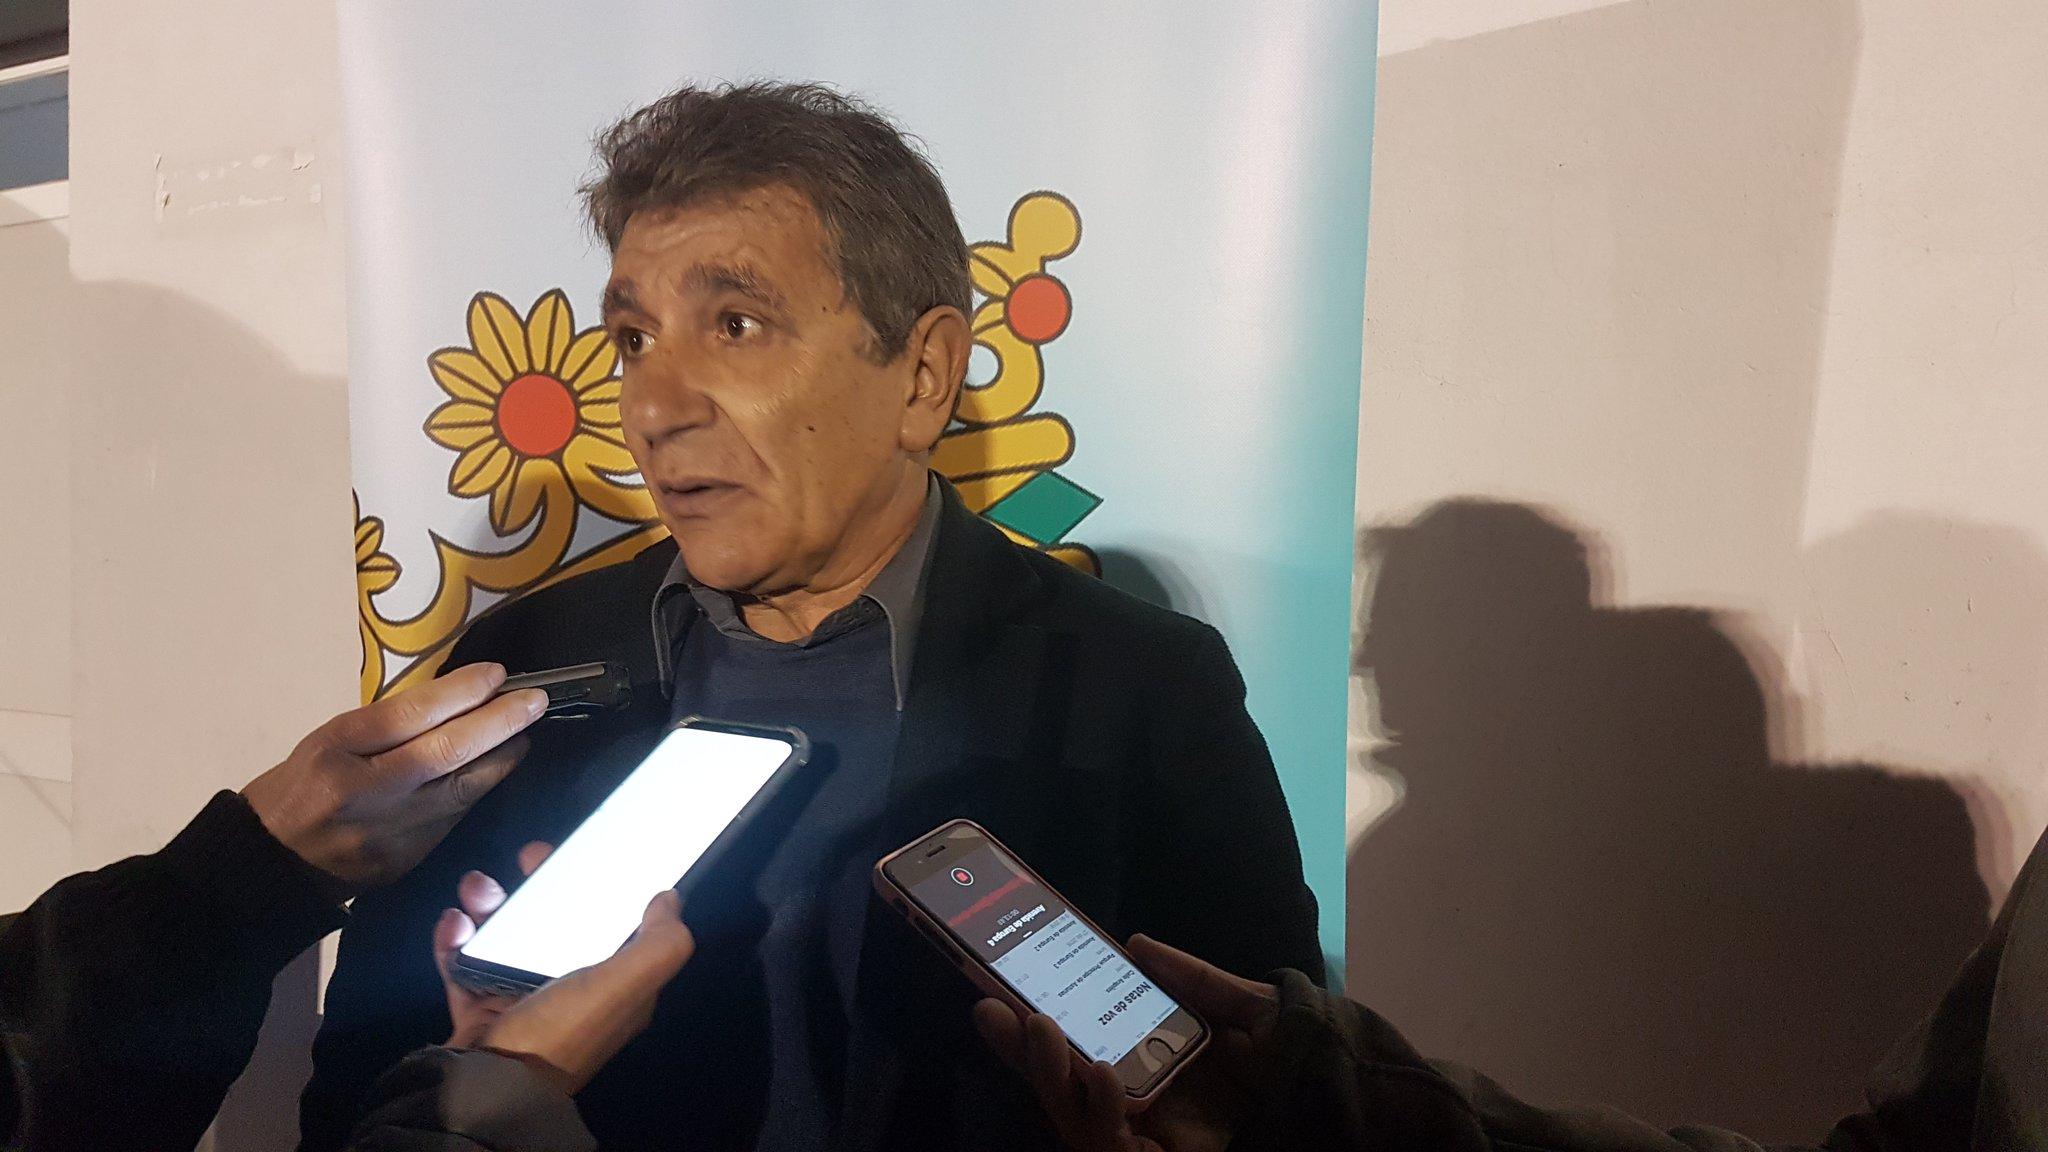 http://www.xerezclubdeportivo.es/wp-content/uploads/2019/01/IMG_20190114_110421.jpg